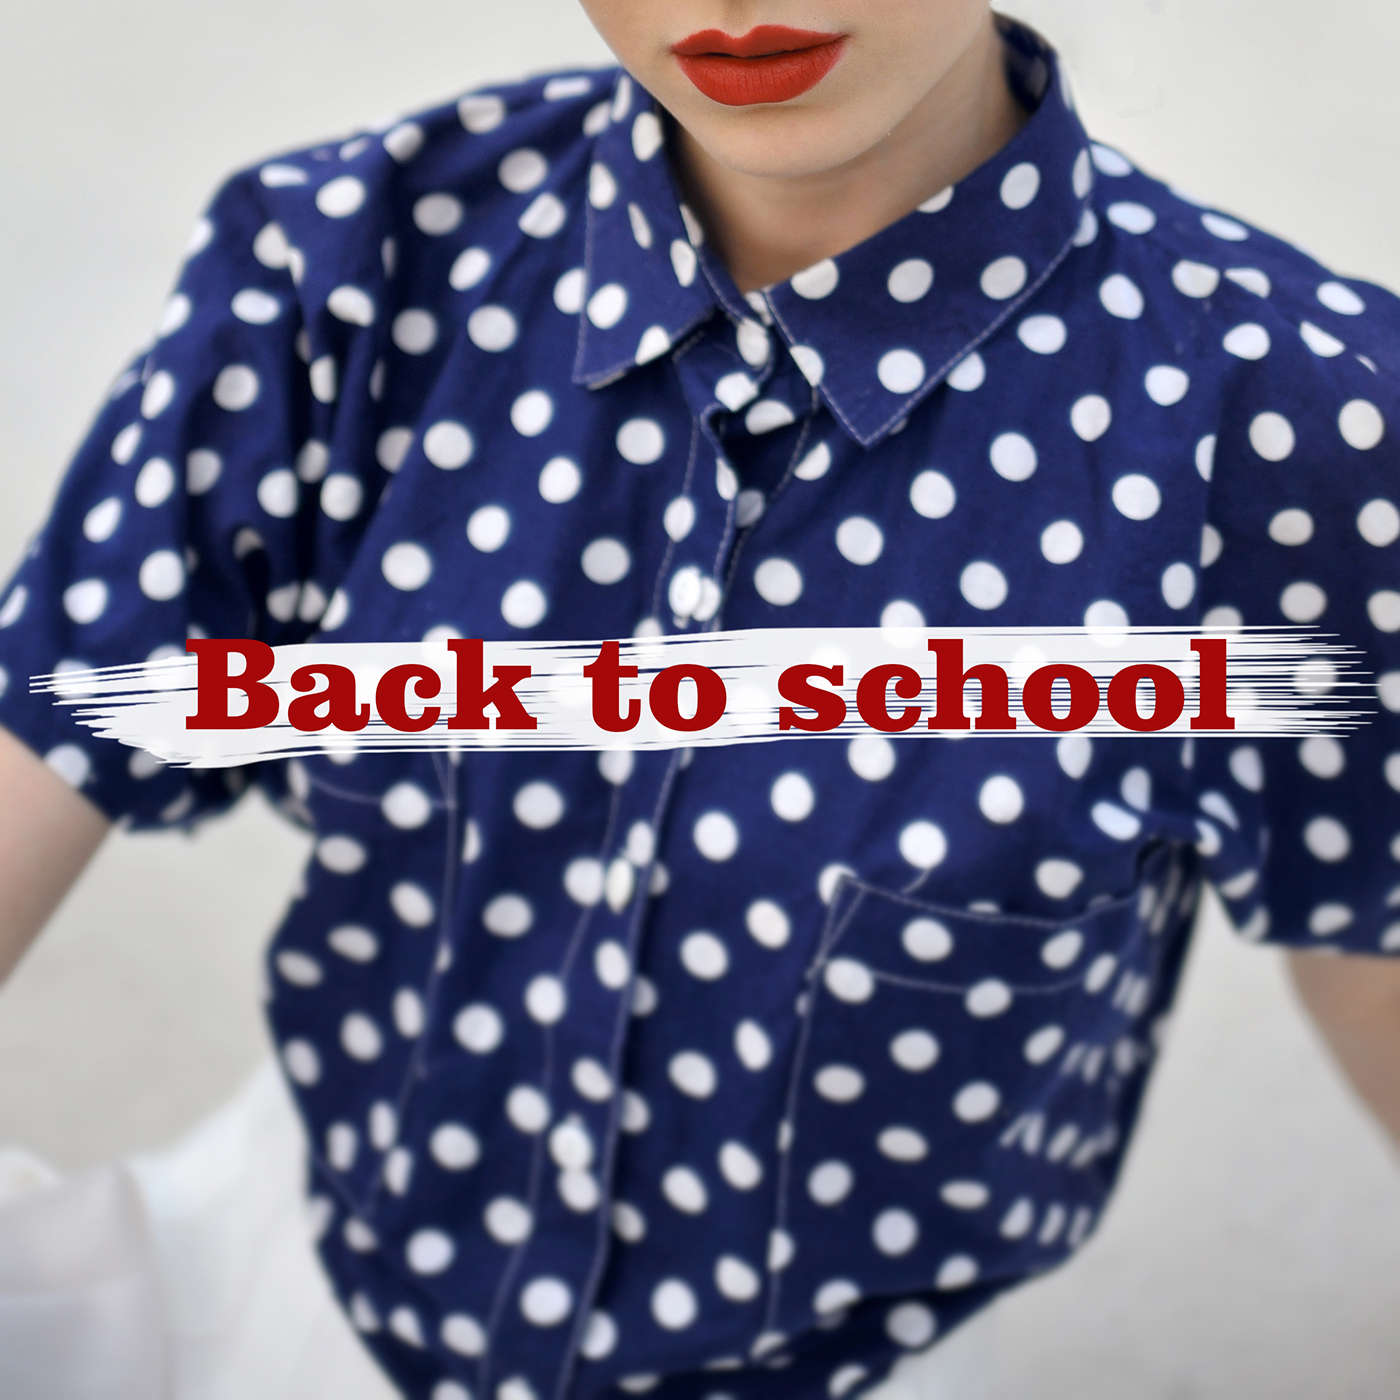 http://idabebe.blogspot.com/2017/10/powrot-do-szkoy-back-to-school.html